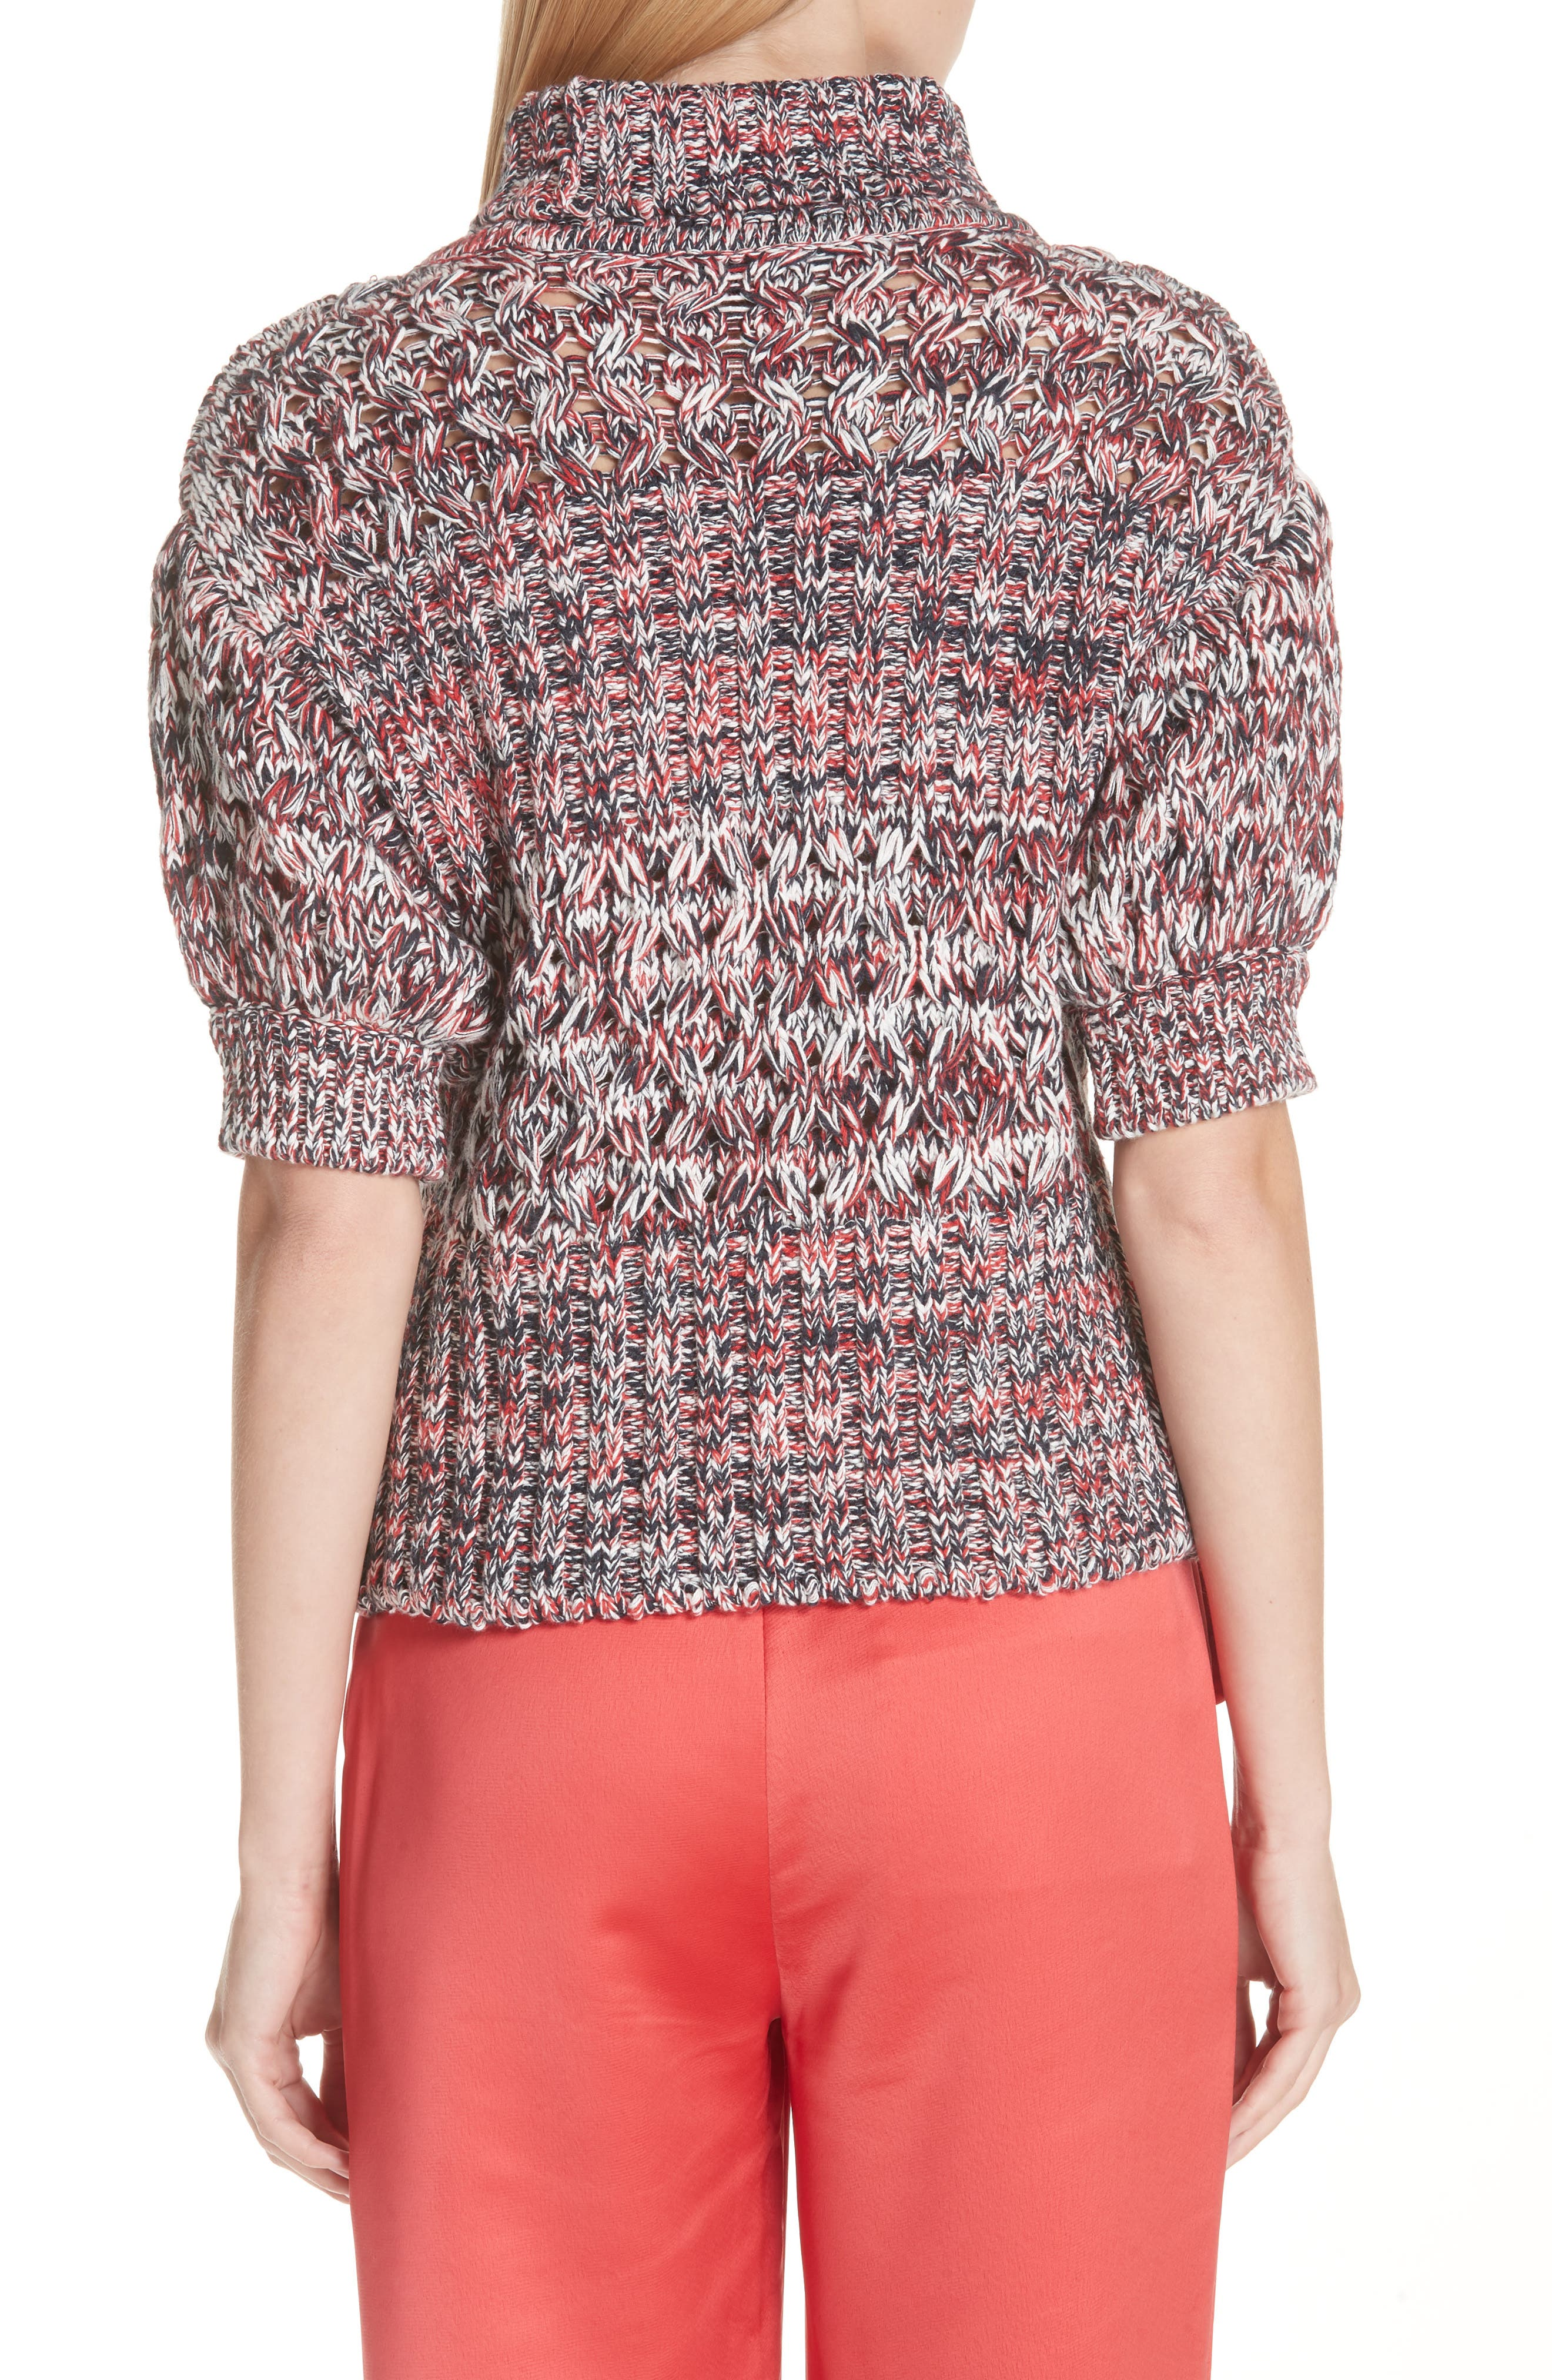 Mélange Cotton & Wool Sweater,                             Alternate thumbnail 2, color,                             600